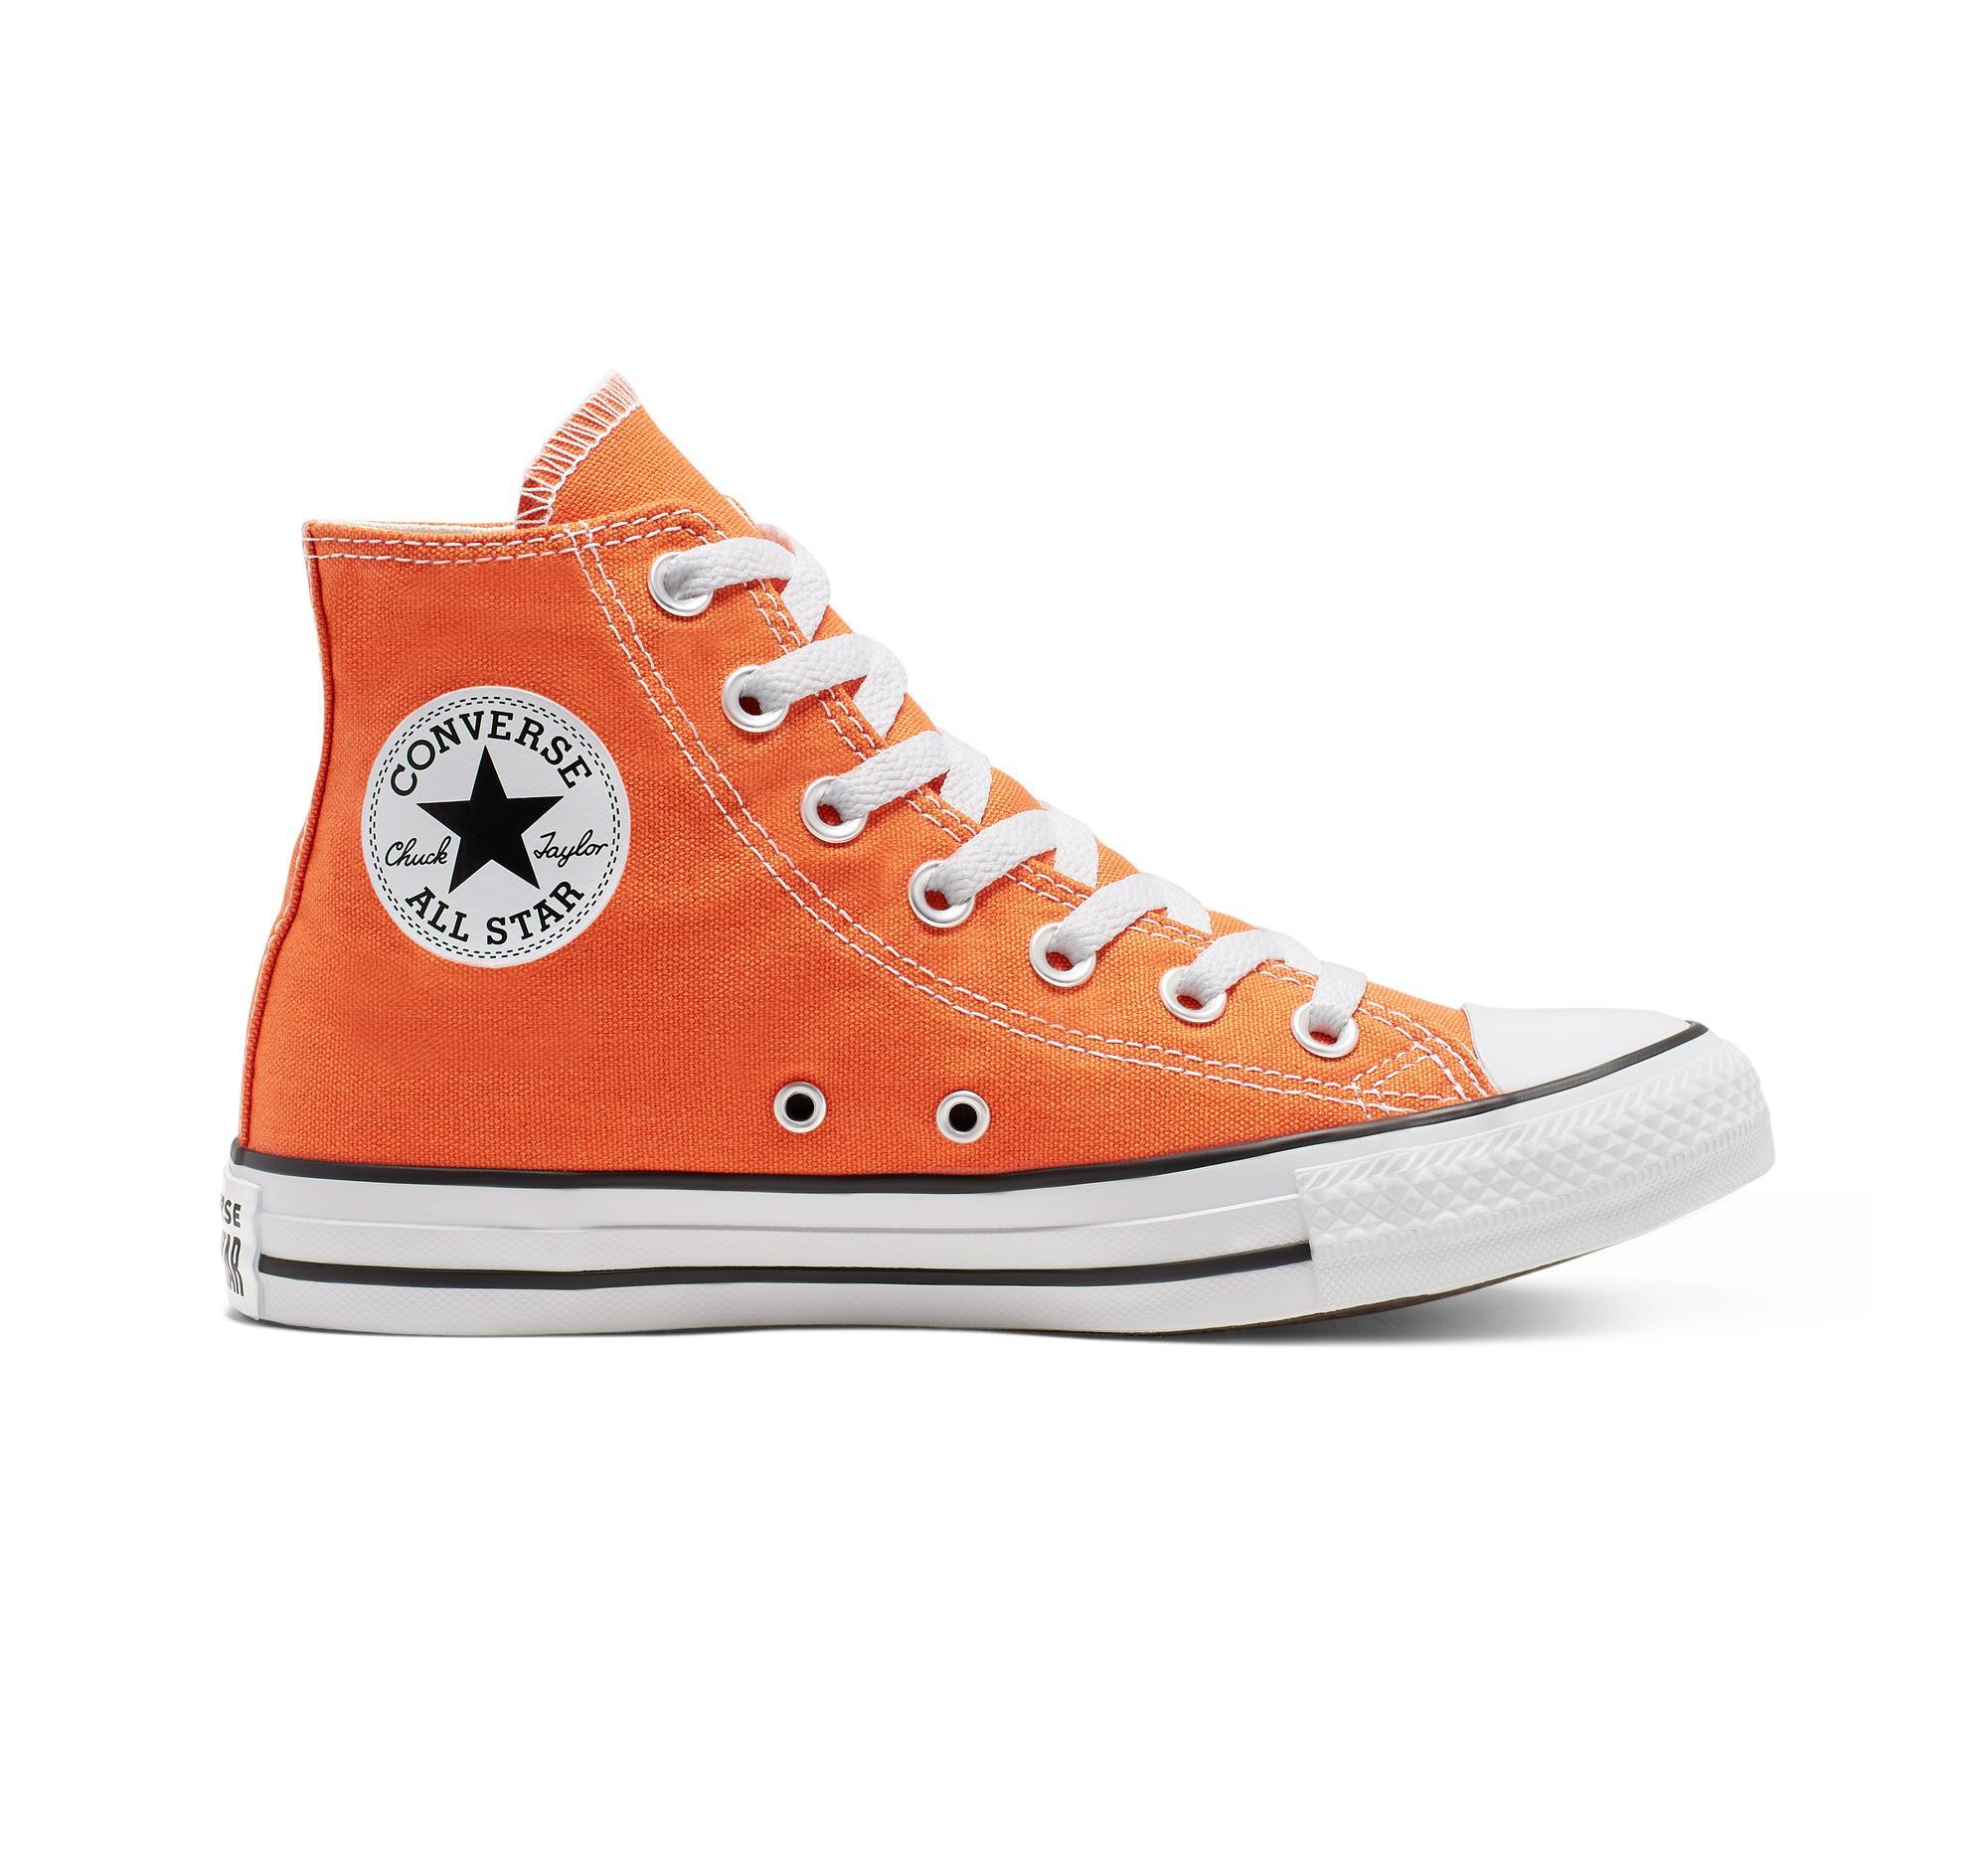 converse chuck taylor orange